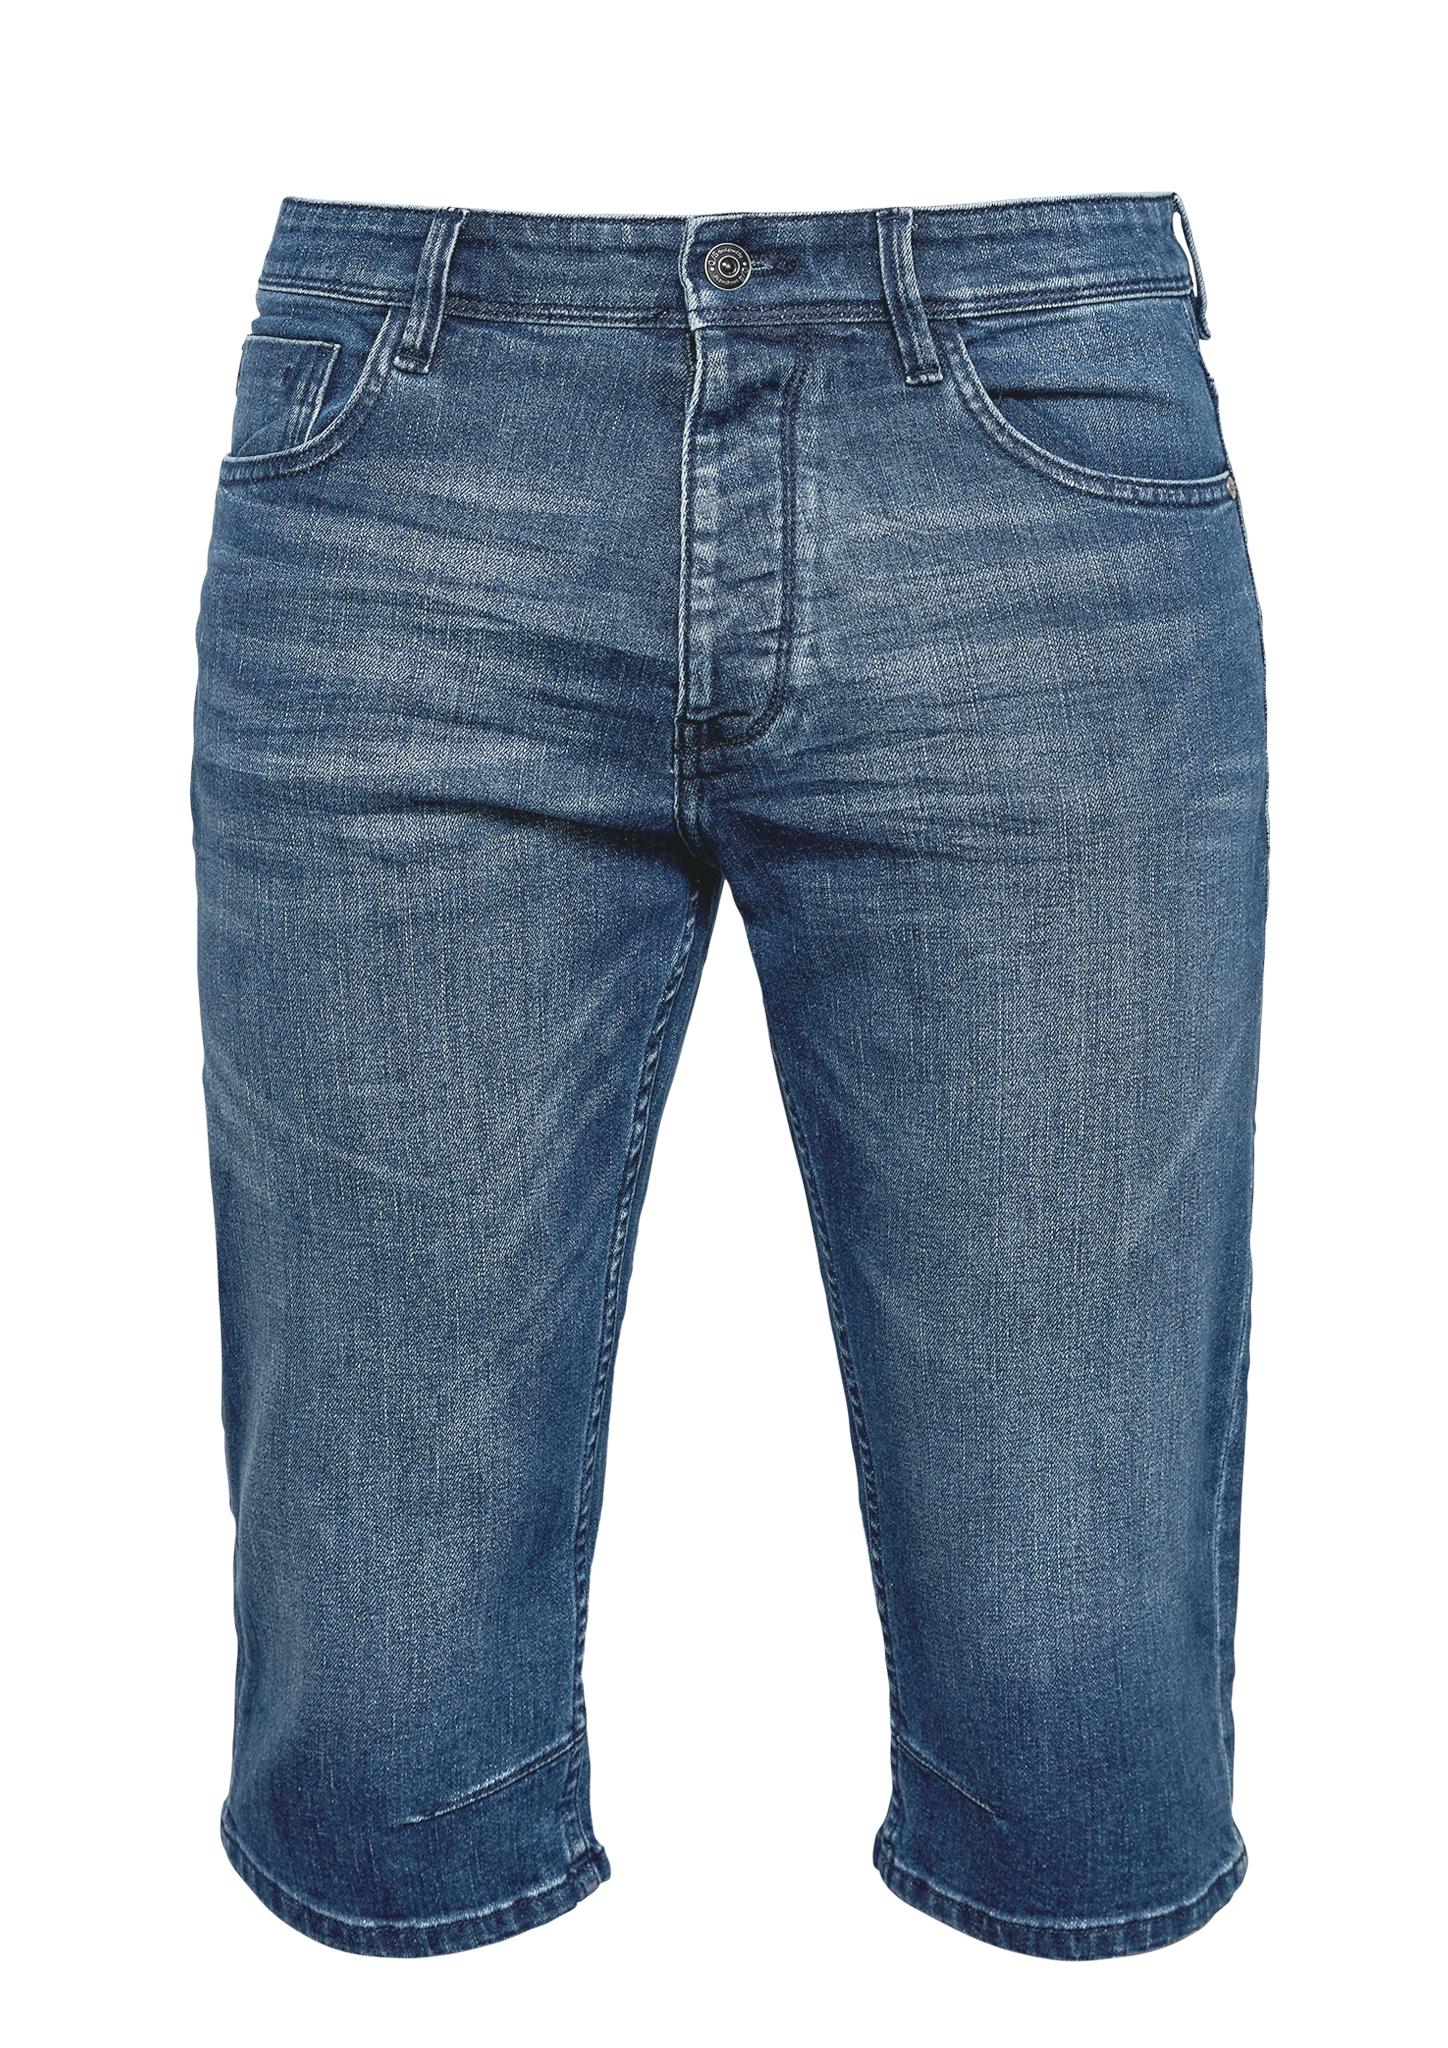 Jeans-Bermuda | Bekleidung > Shorts & Bermudas > Jeans Bermudas | Blau | 98% baumwolle -  2% elasthan | Q/S designed by